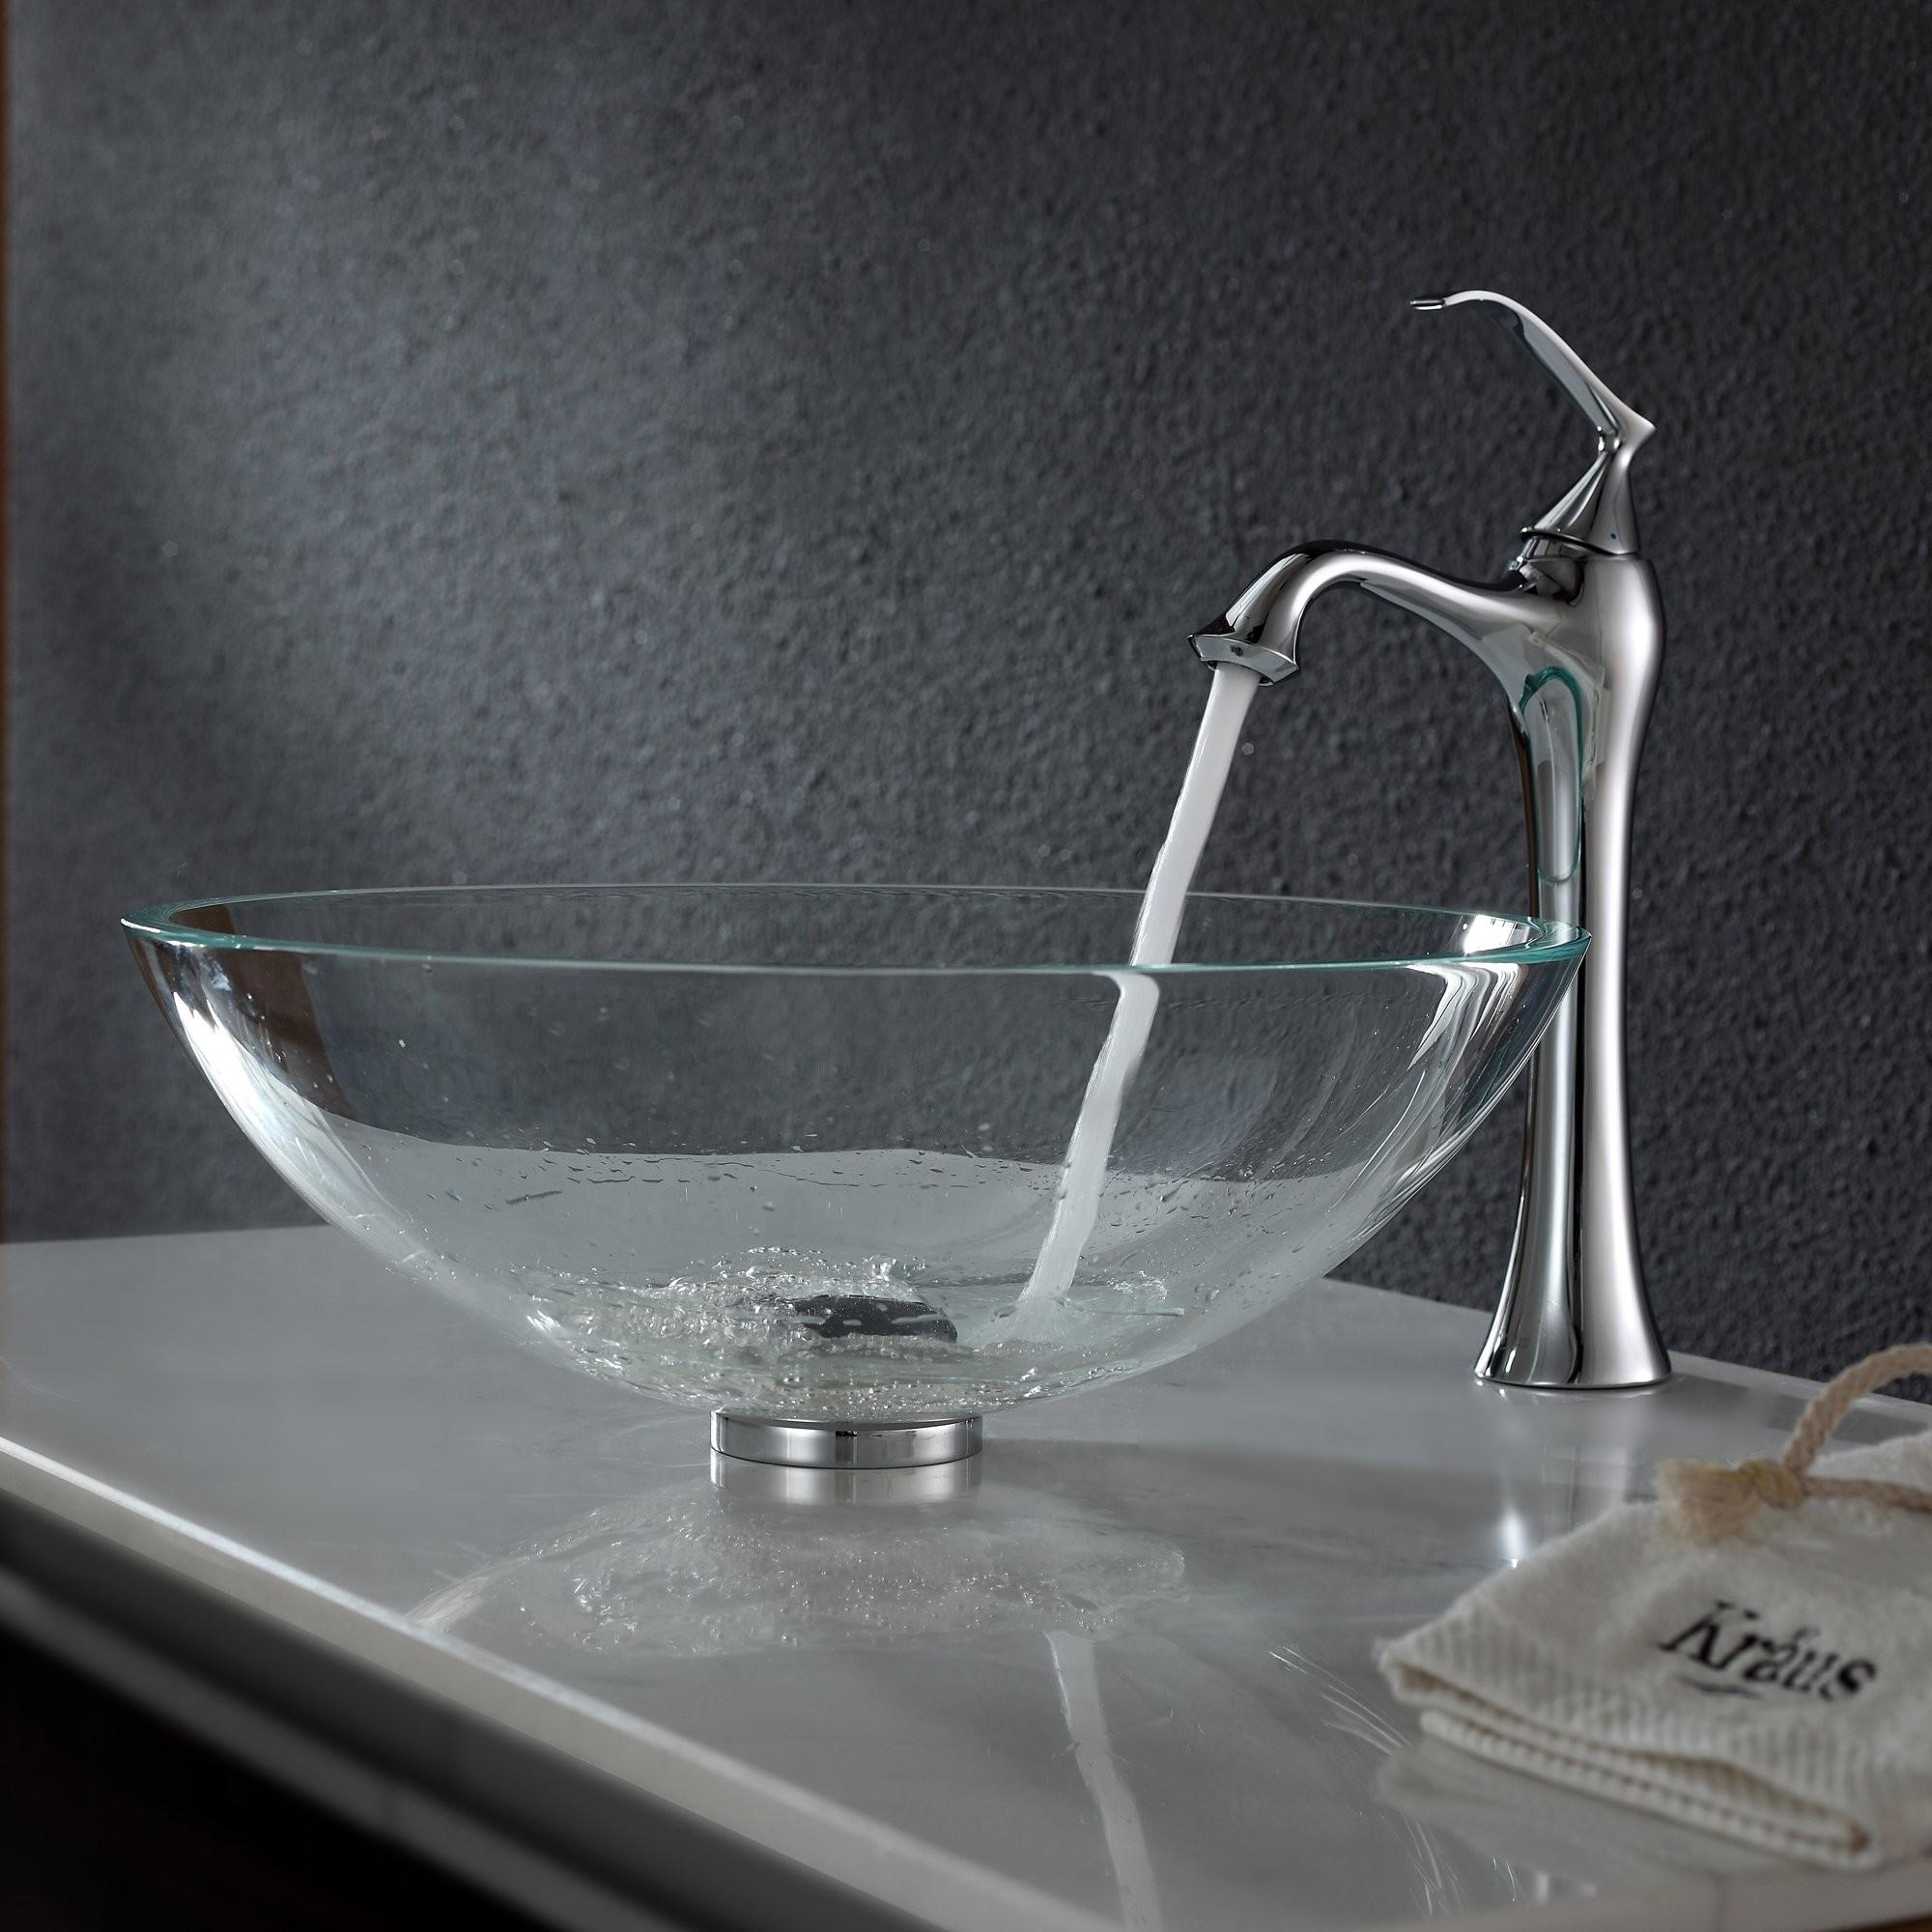 Ideas, vessel sink and faucet combos vessel sink and faucet combos bathroom glass vessel sink and faucet combination kraususa 2000 x 2000 3  .